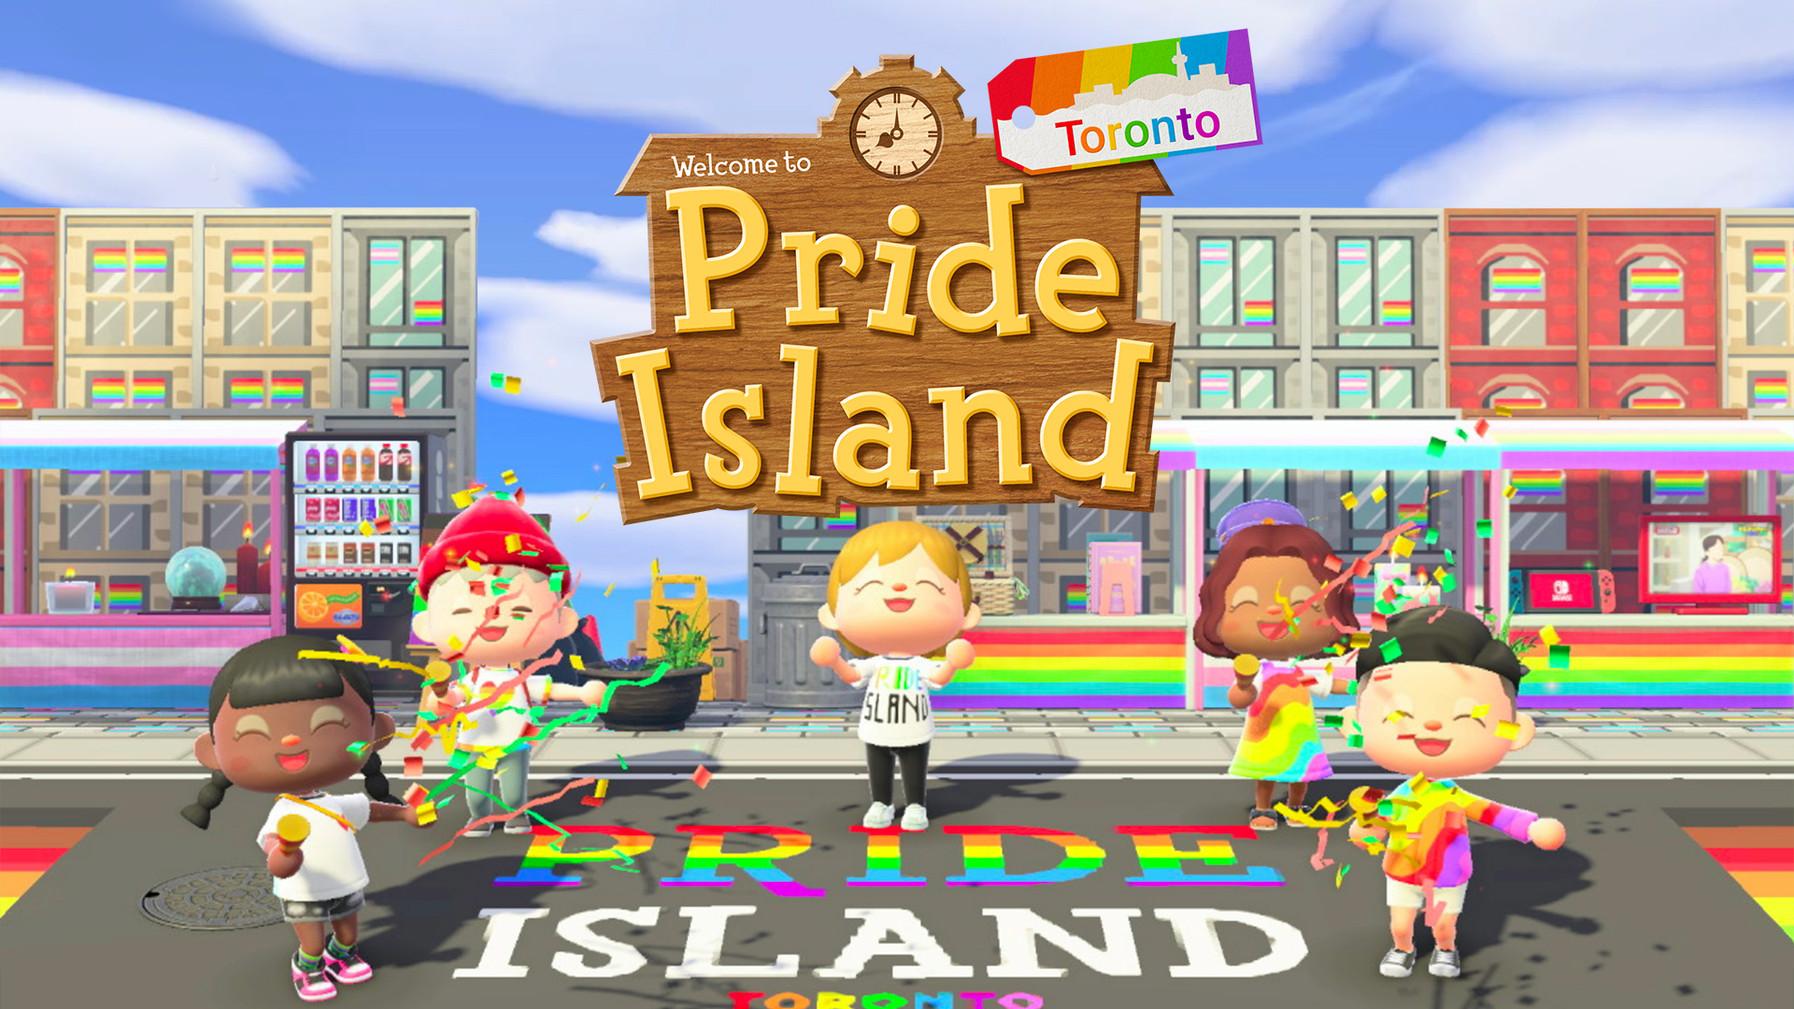 PrideIsland_01.jpg